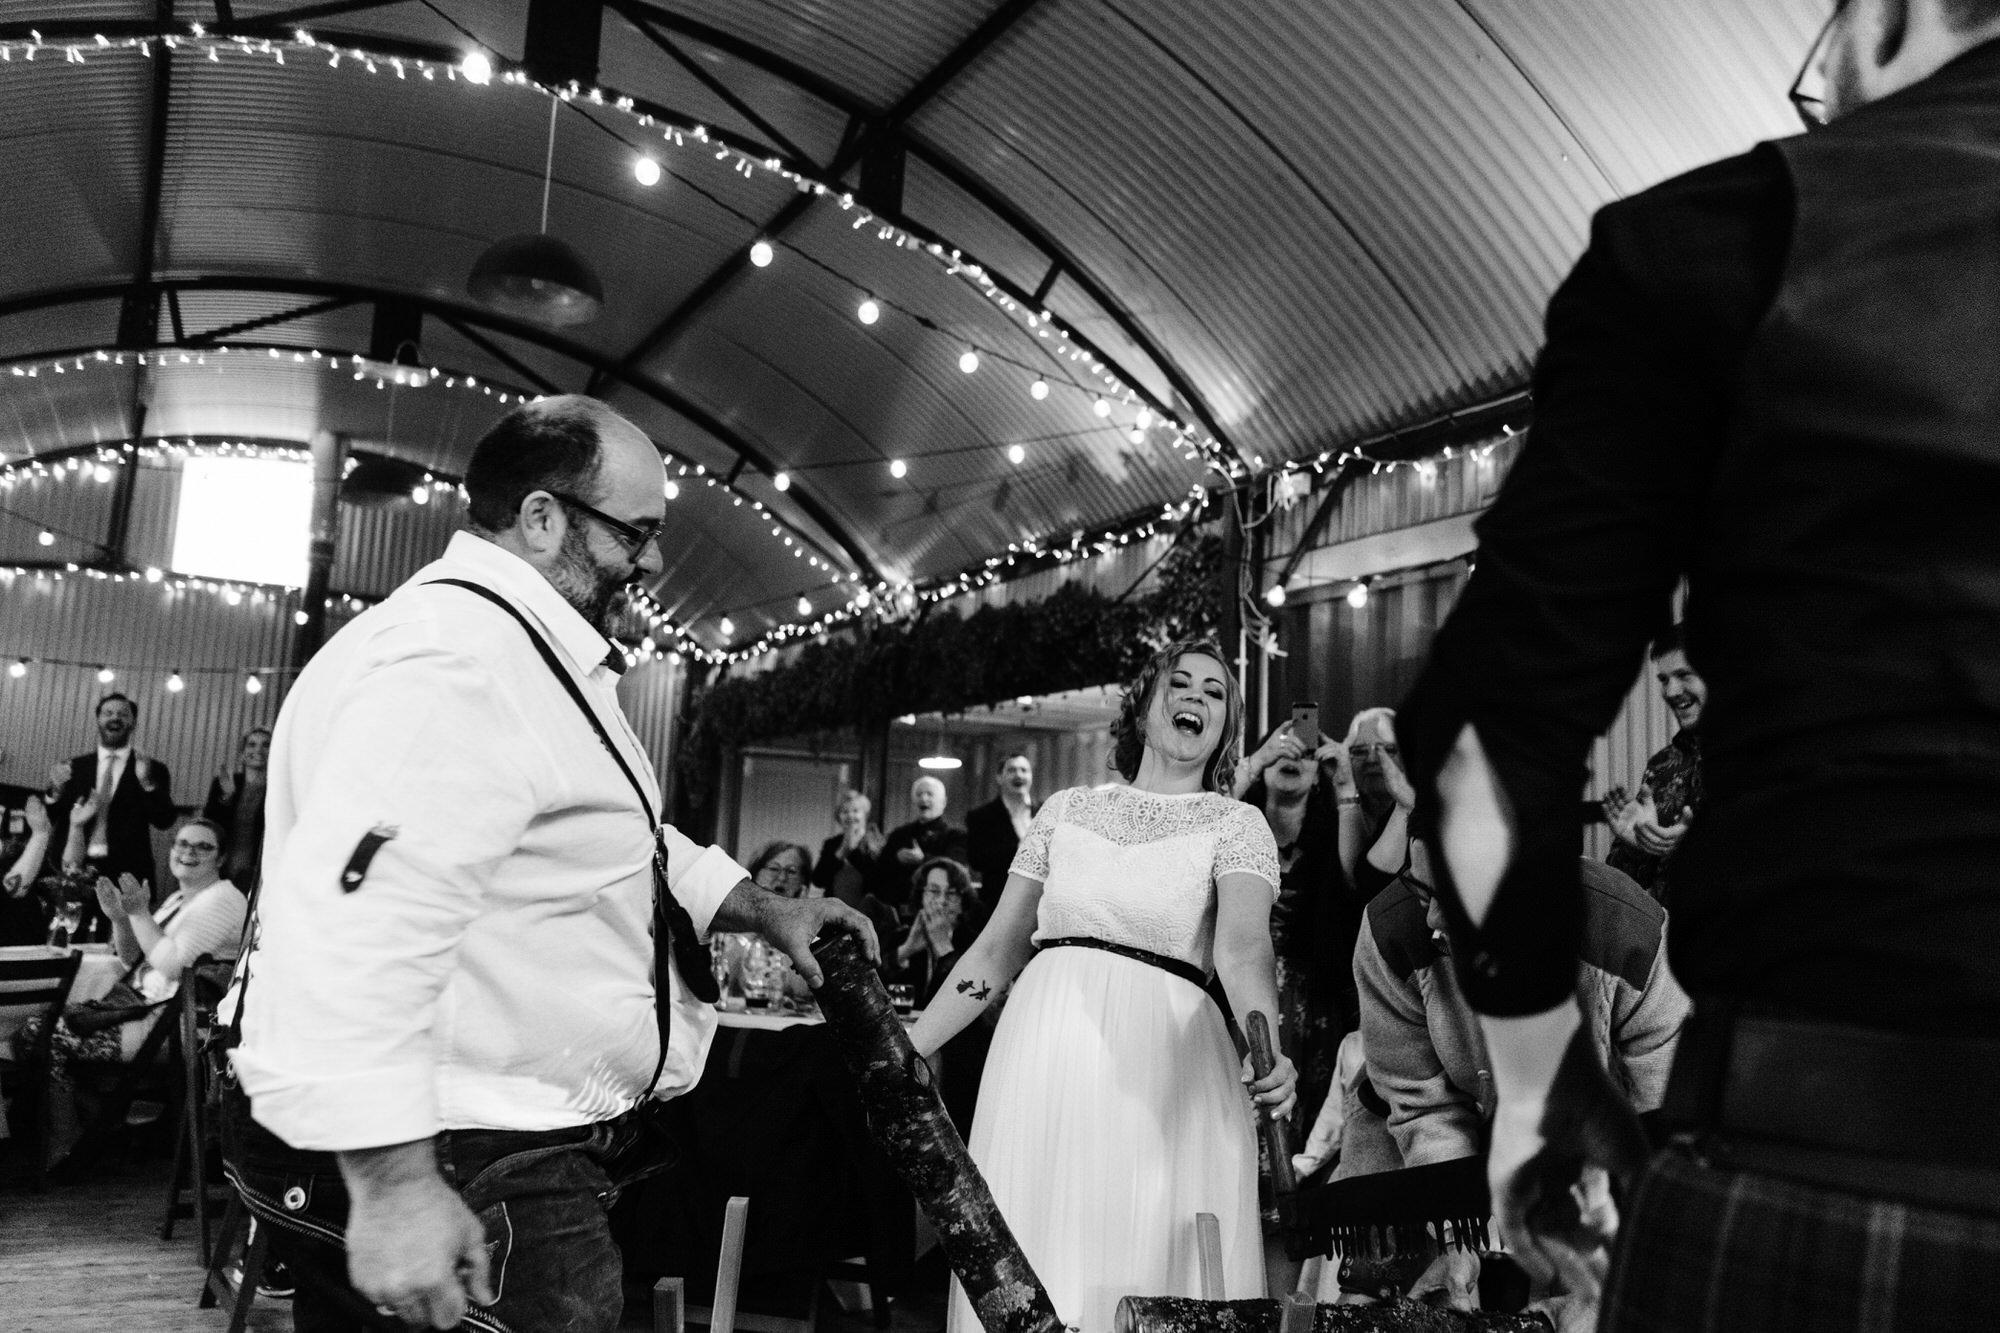 059 TIN SHED KNOCKRAICH WEDDING AUSTRIAN SCOTTISH ZOE ALEXANDRA PHOTOGRAPHY